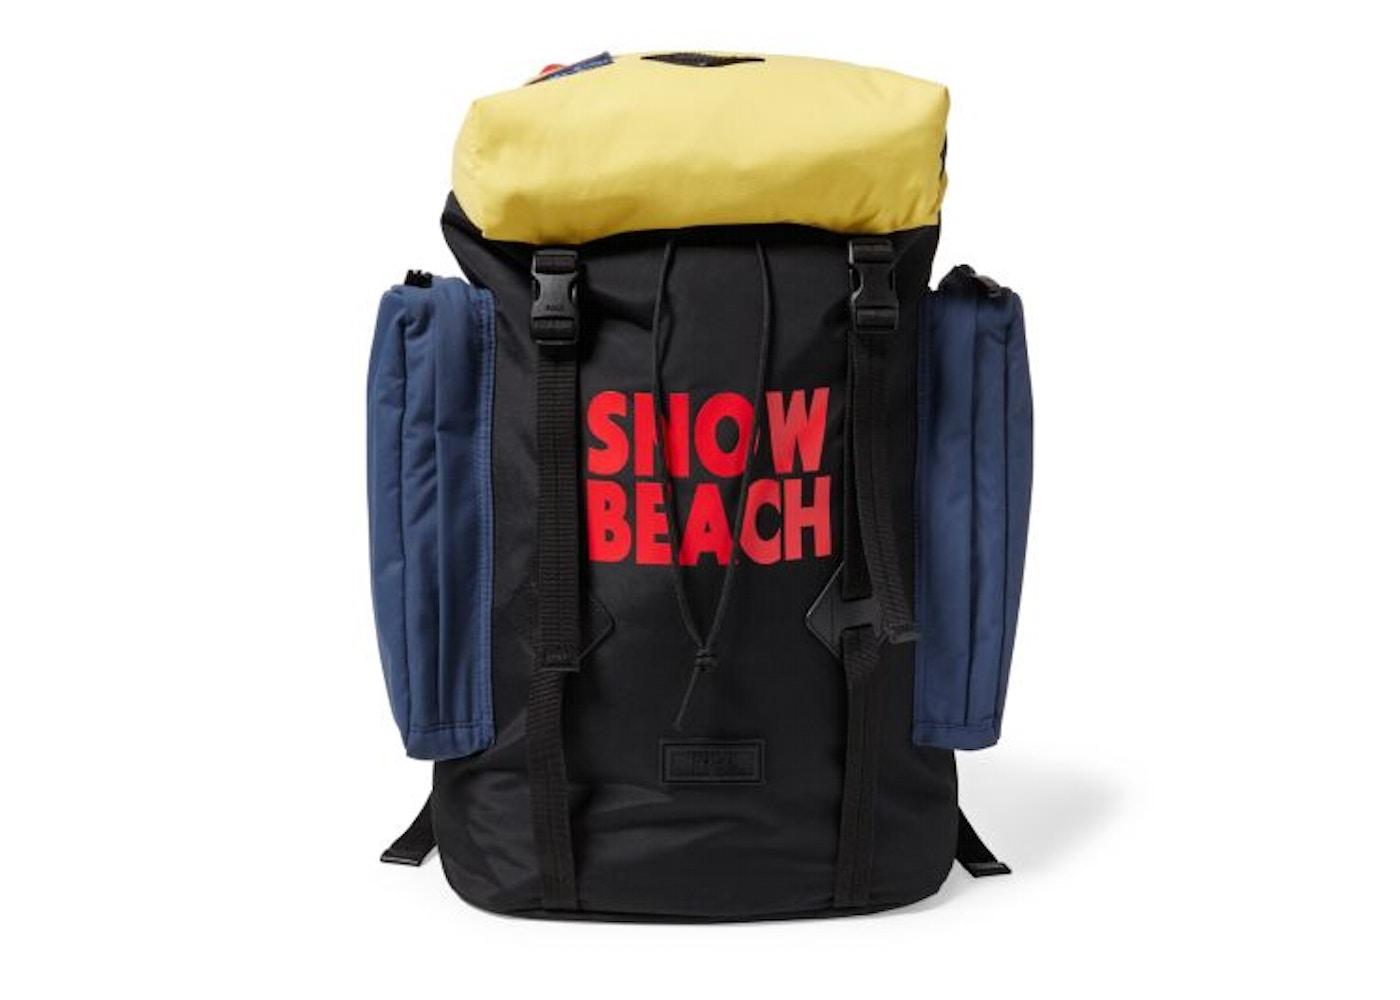 fea6611153a0 Polo Ralph Lauren Snow Beach Backpack Multi. Snow Beach